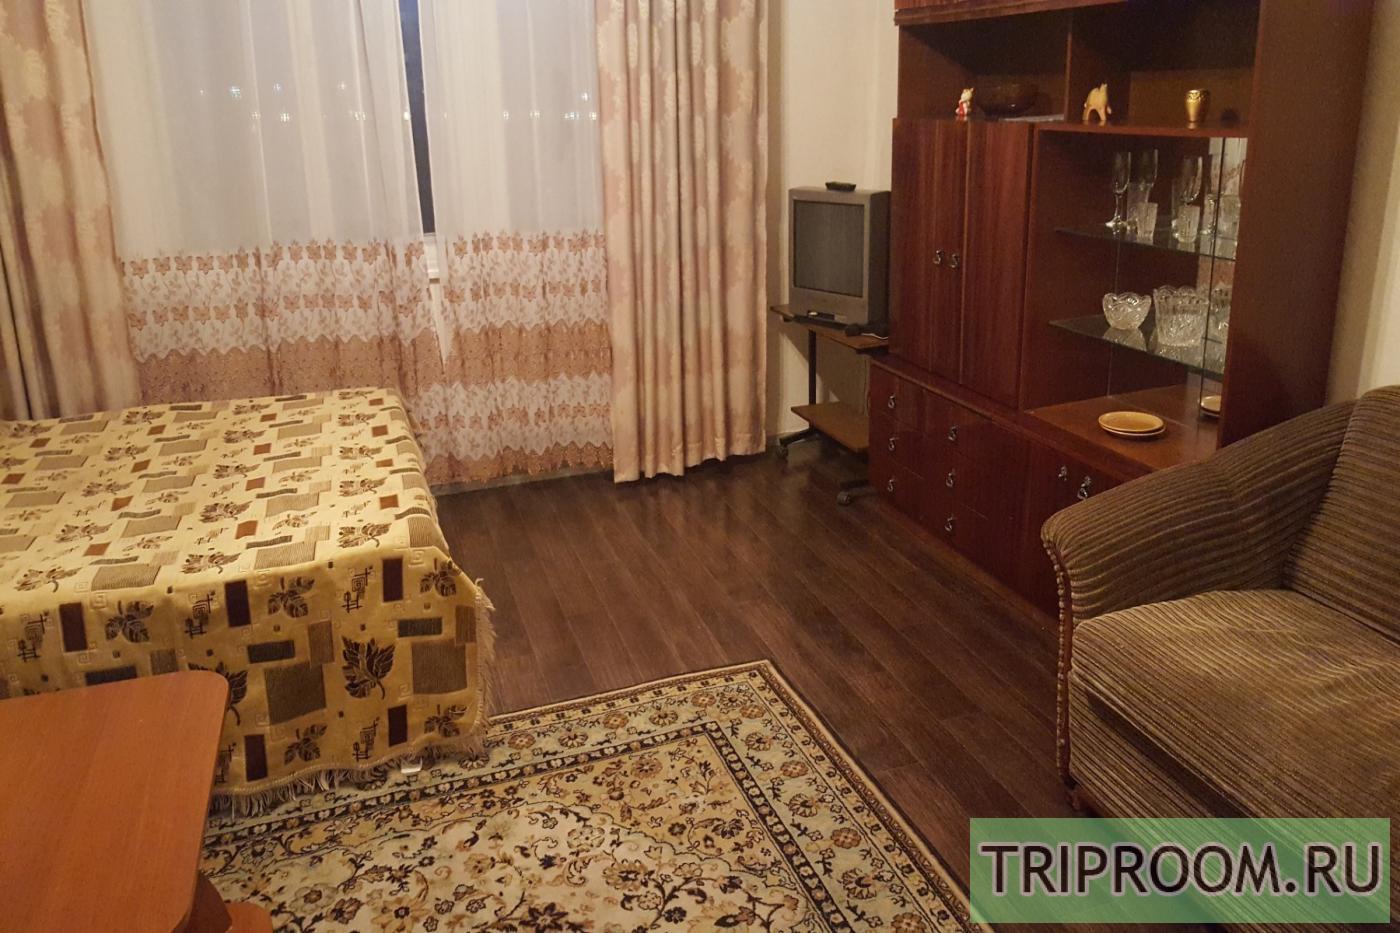 1-комнатная квартира посуточно (вариант № 30851), ул. Циолковского улица, фото № 3